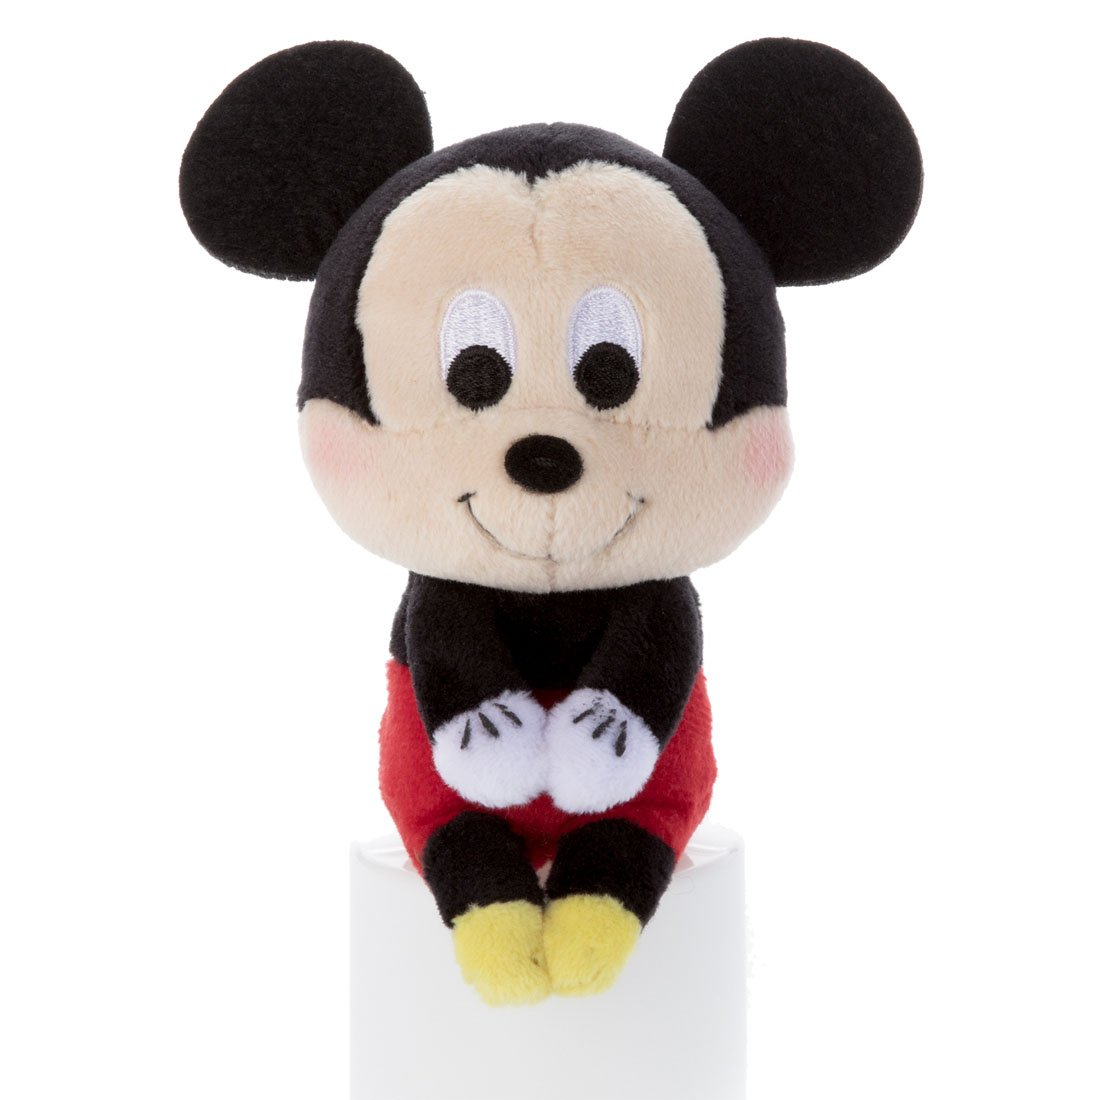 Disney character ''chokkorisan'' Mickey Mouse plush doll (Disney Friends)